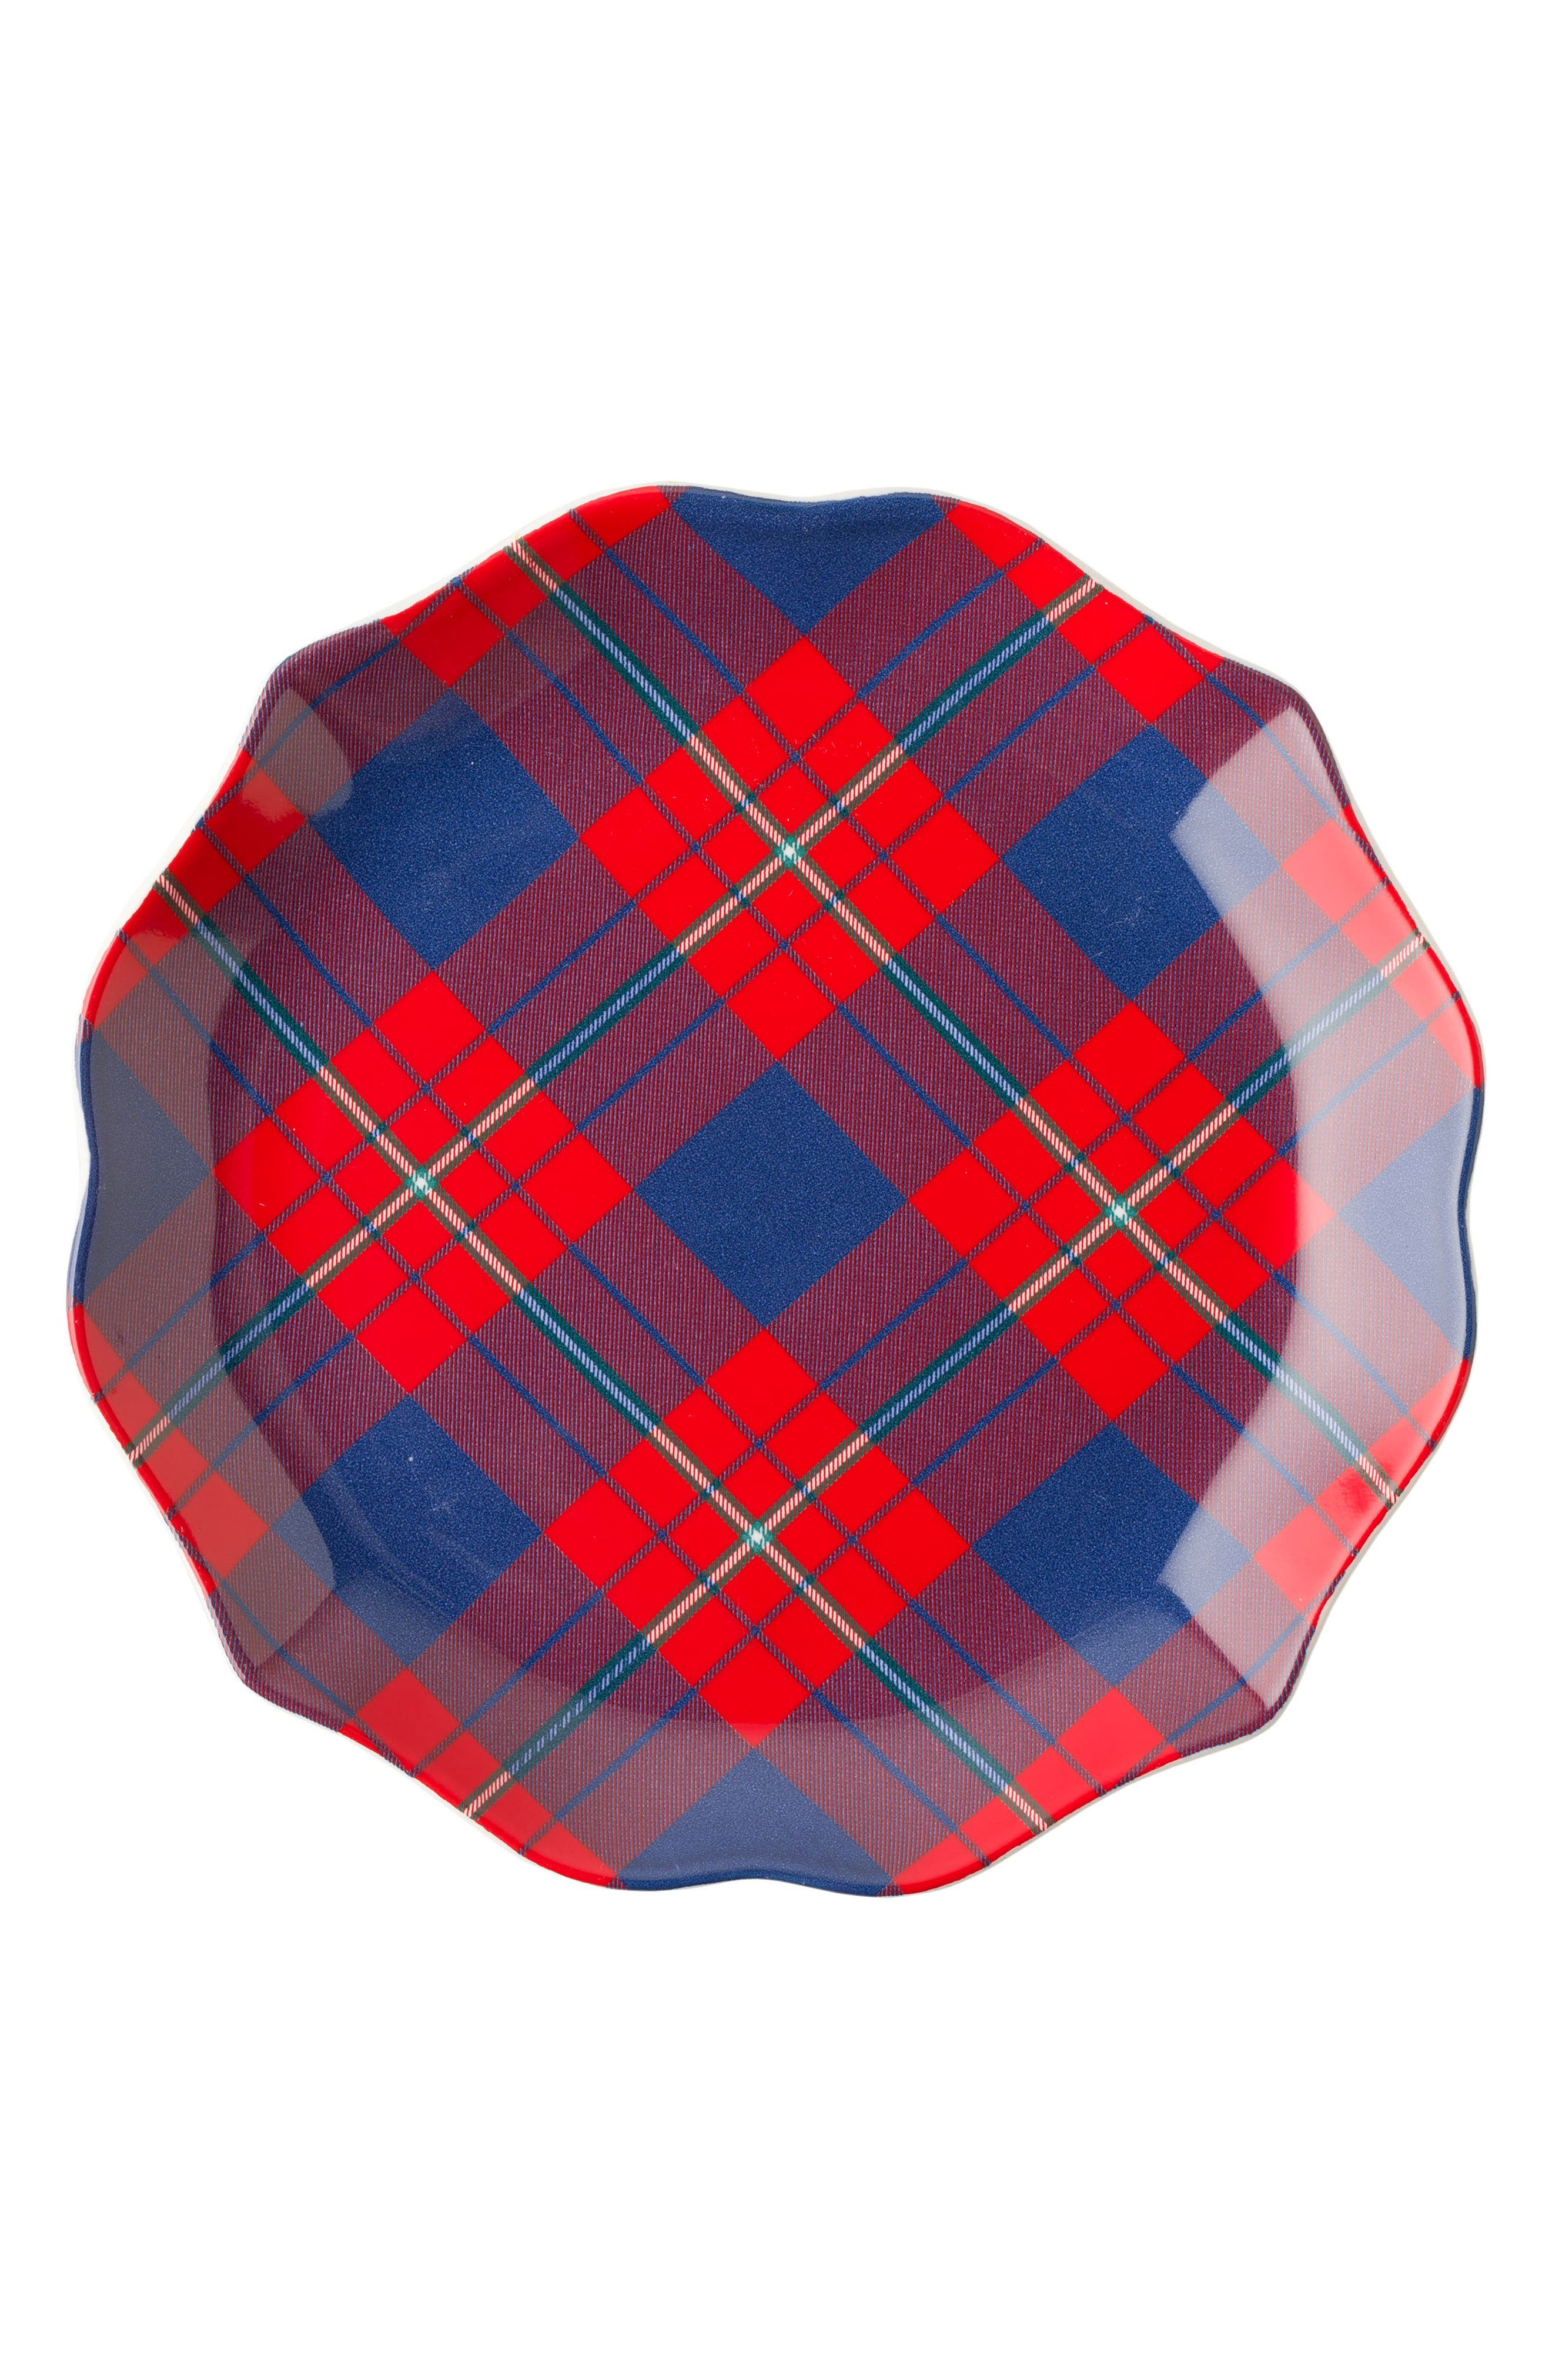 New Traditions - Tartan Tidbit Set of 4 Plates,                             Alternate thumbnail 3, color,                             400